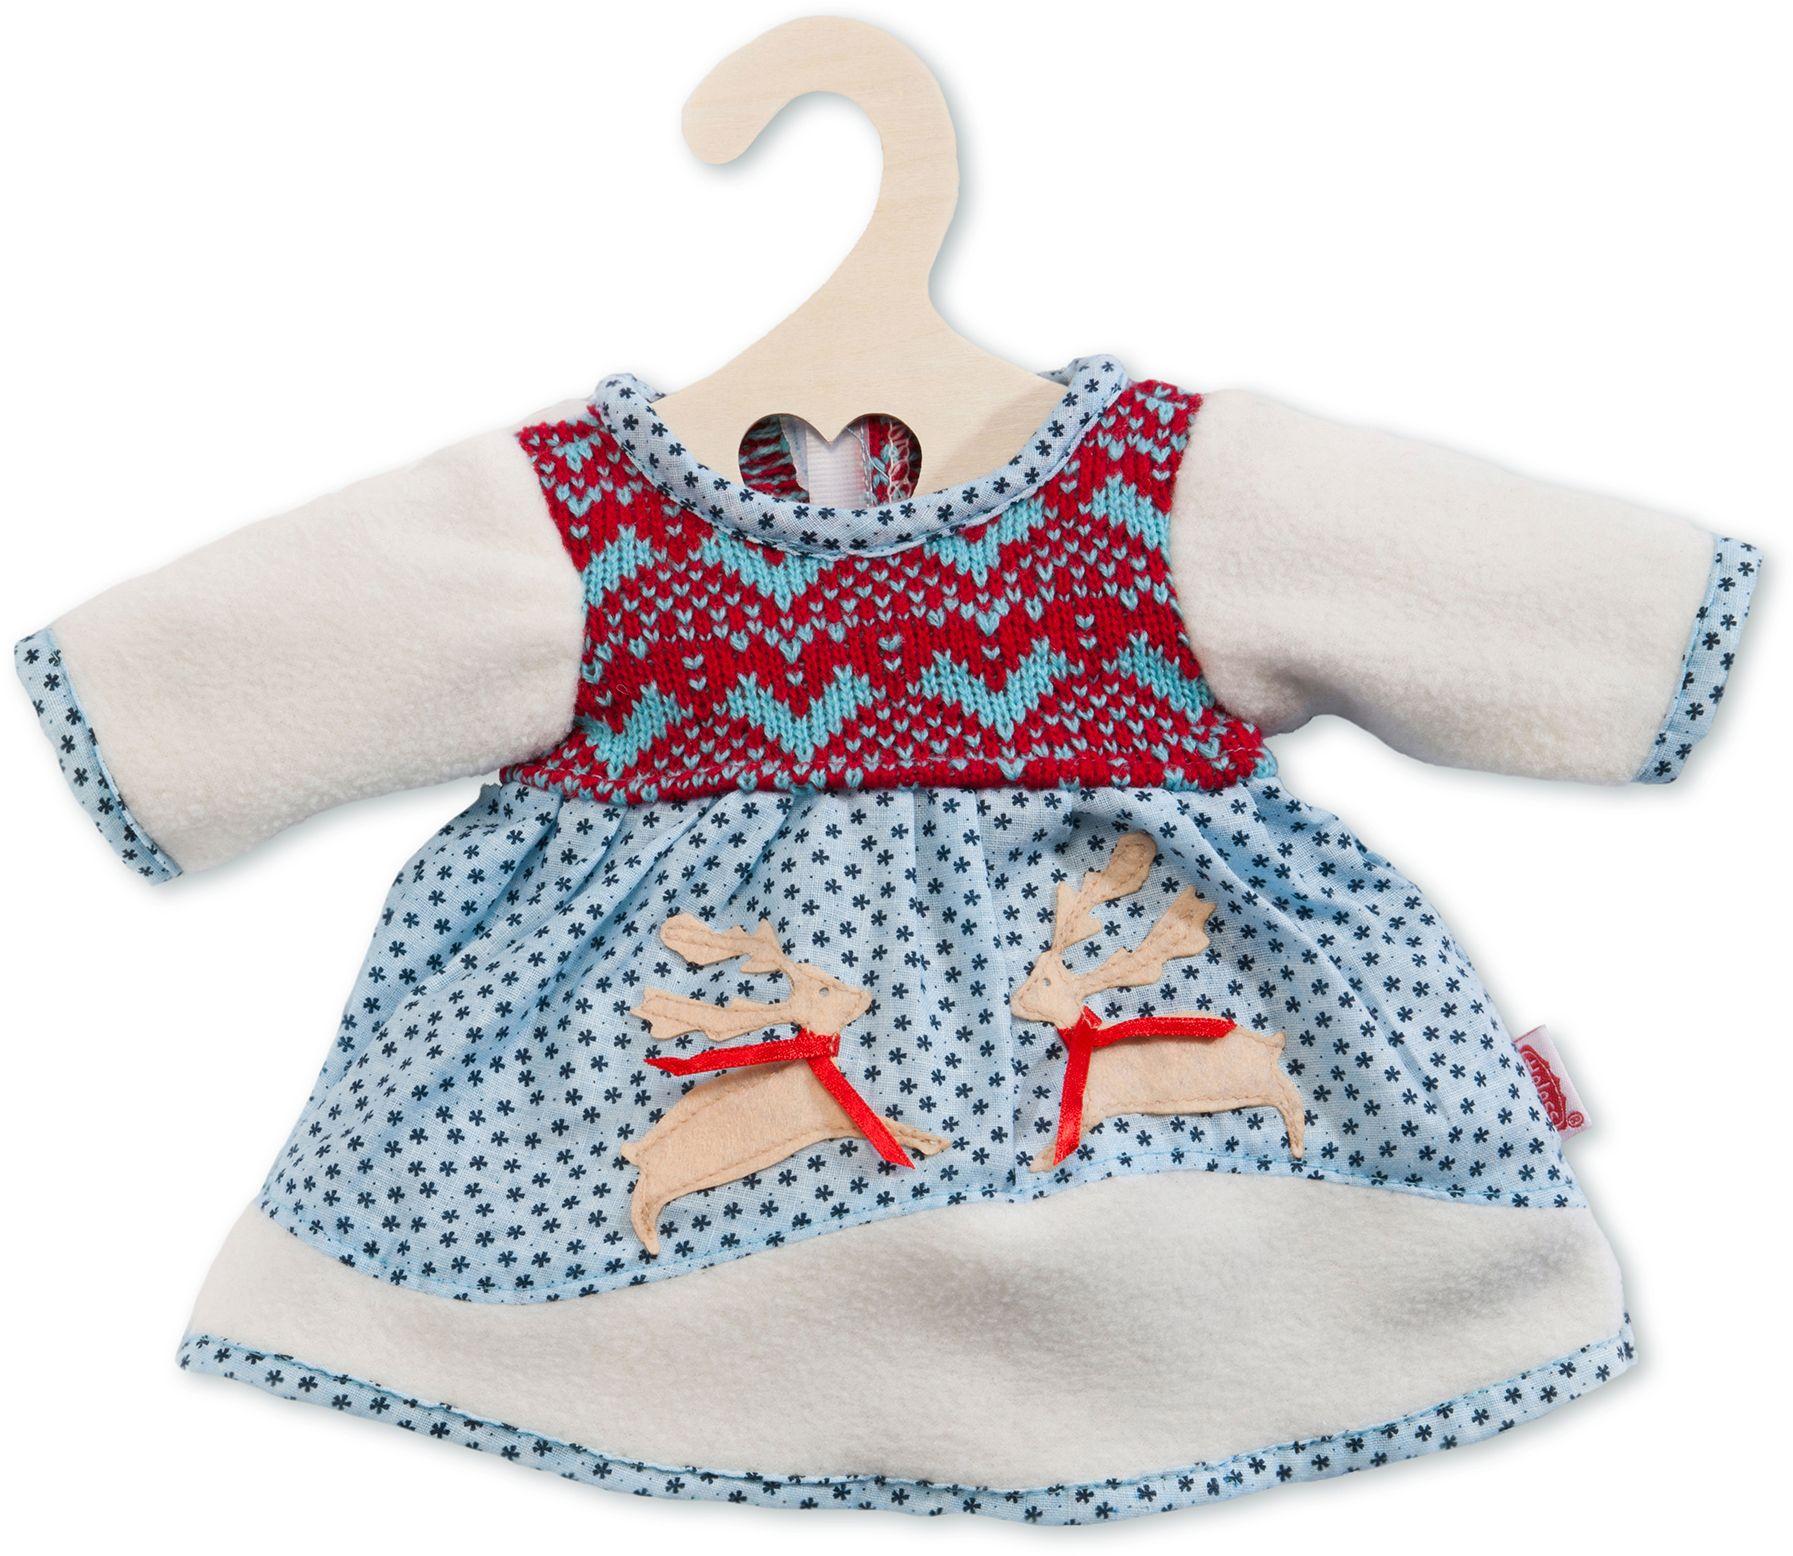 HELESS® Heless® Puppenkleidung Größe 28-33 cm o. 35-45 cm, »Winterkleid«